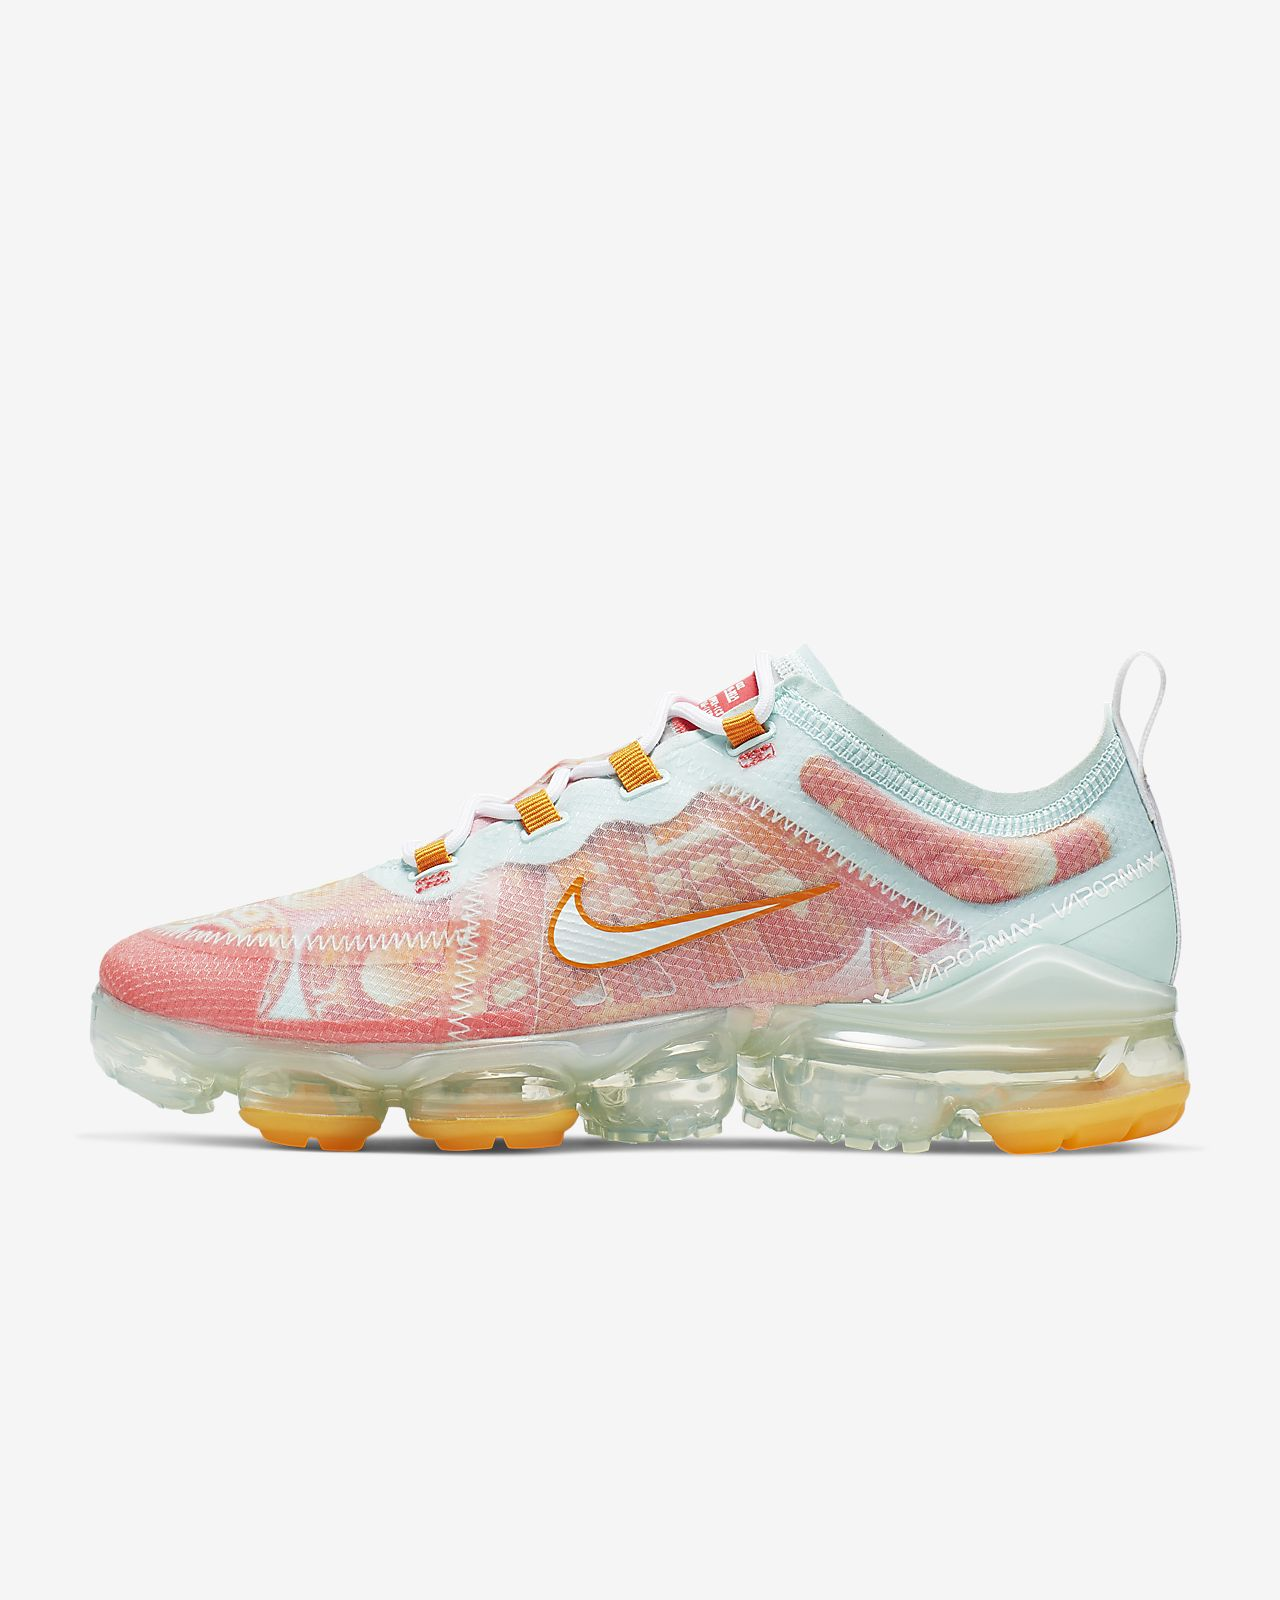 NikeAir VapoMax 2019 QS 女子运动鞋